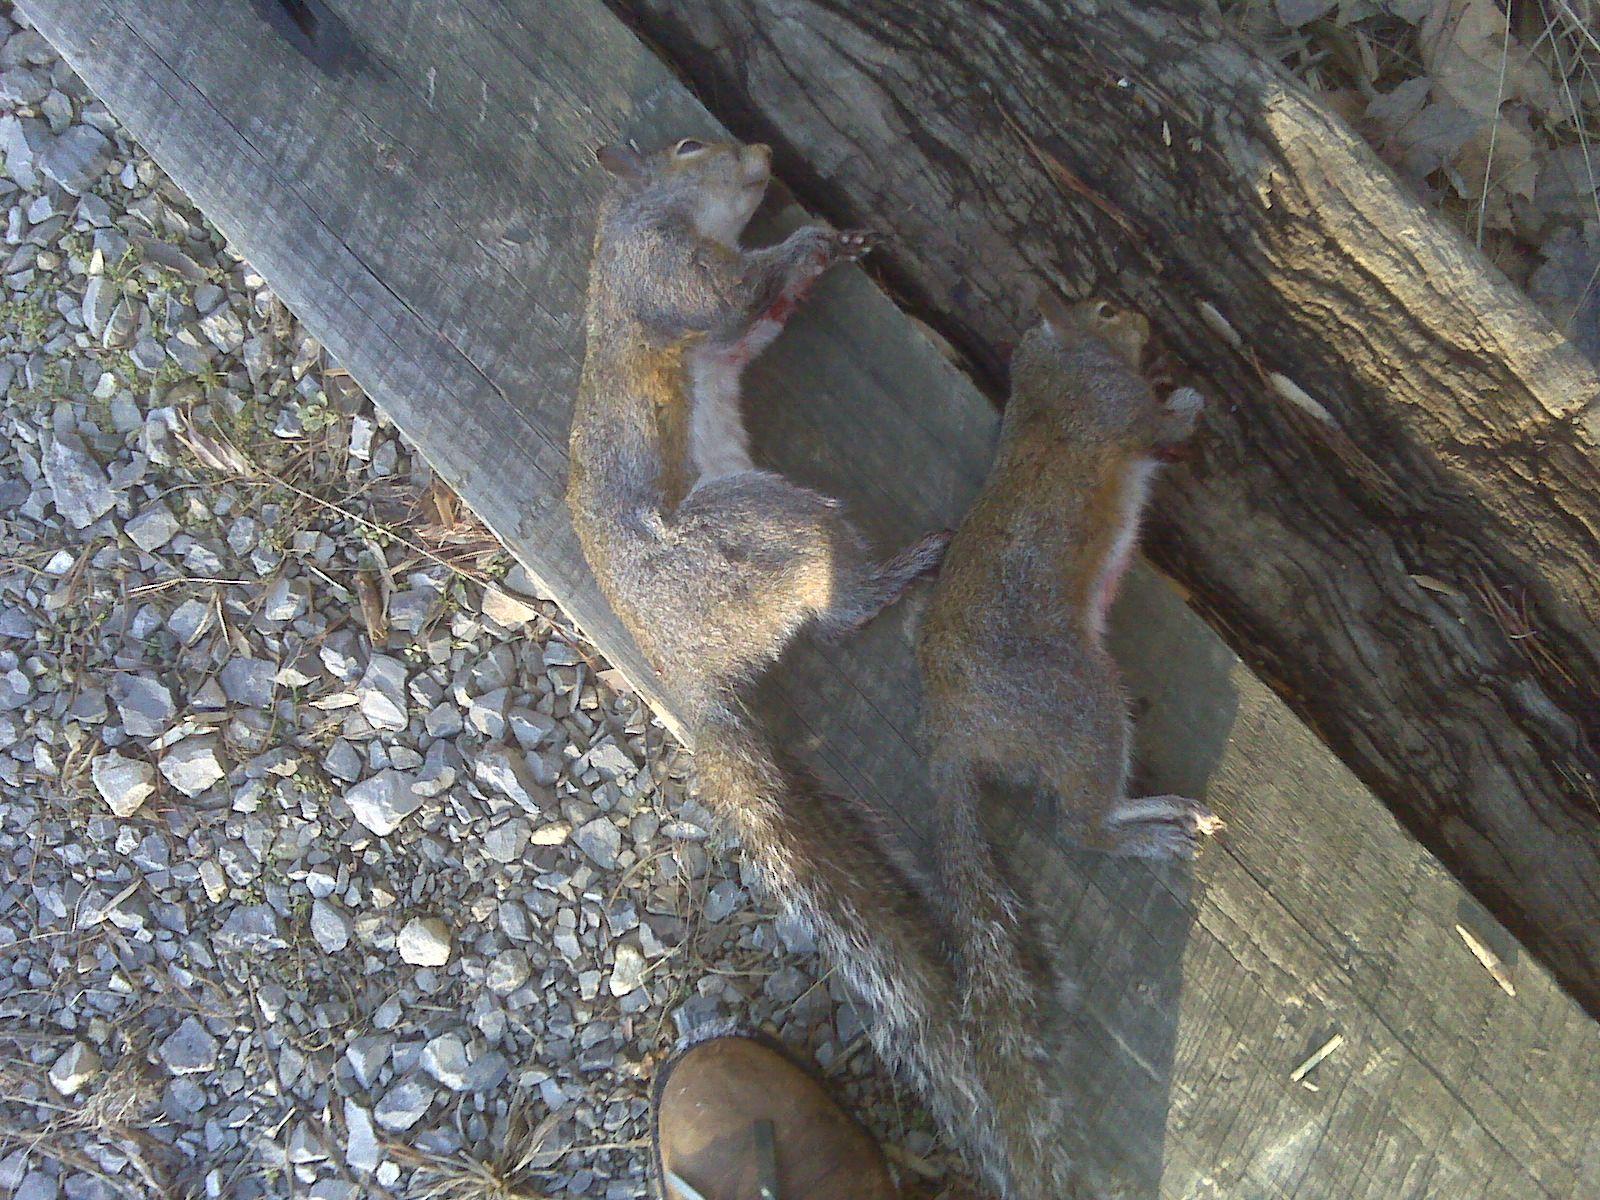 Fat Squirrel With Guns